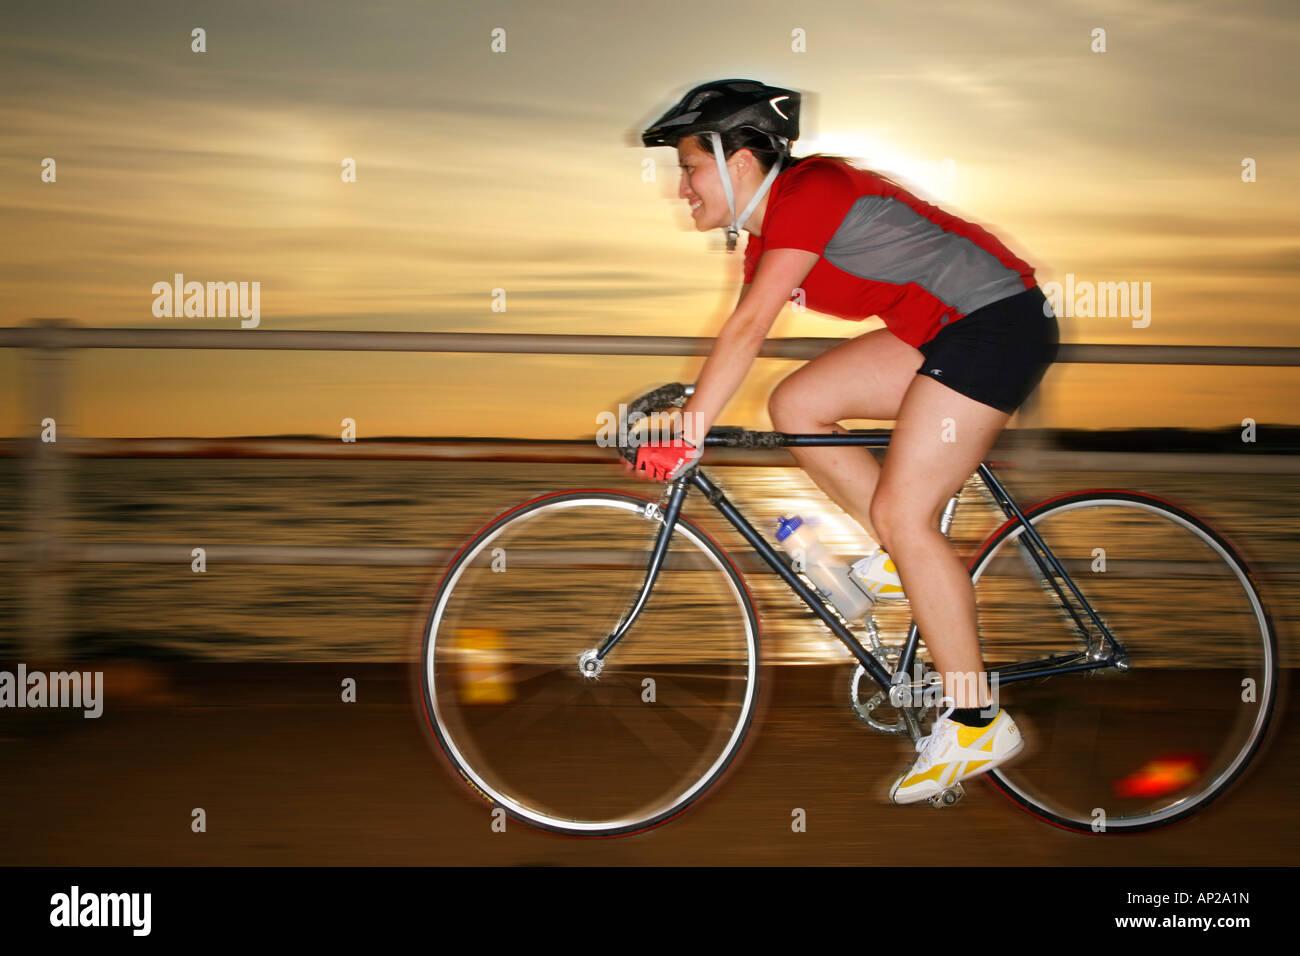 Joven de 26 años librar bicicleta sunset, señor-09-30-2007 Imagen De Stock